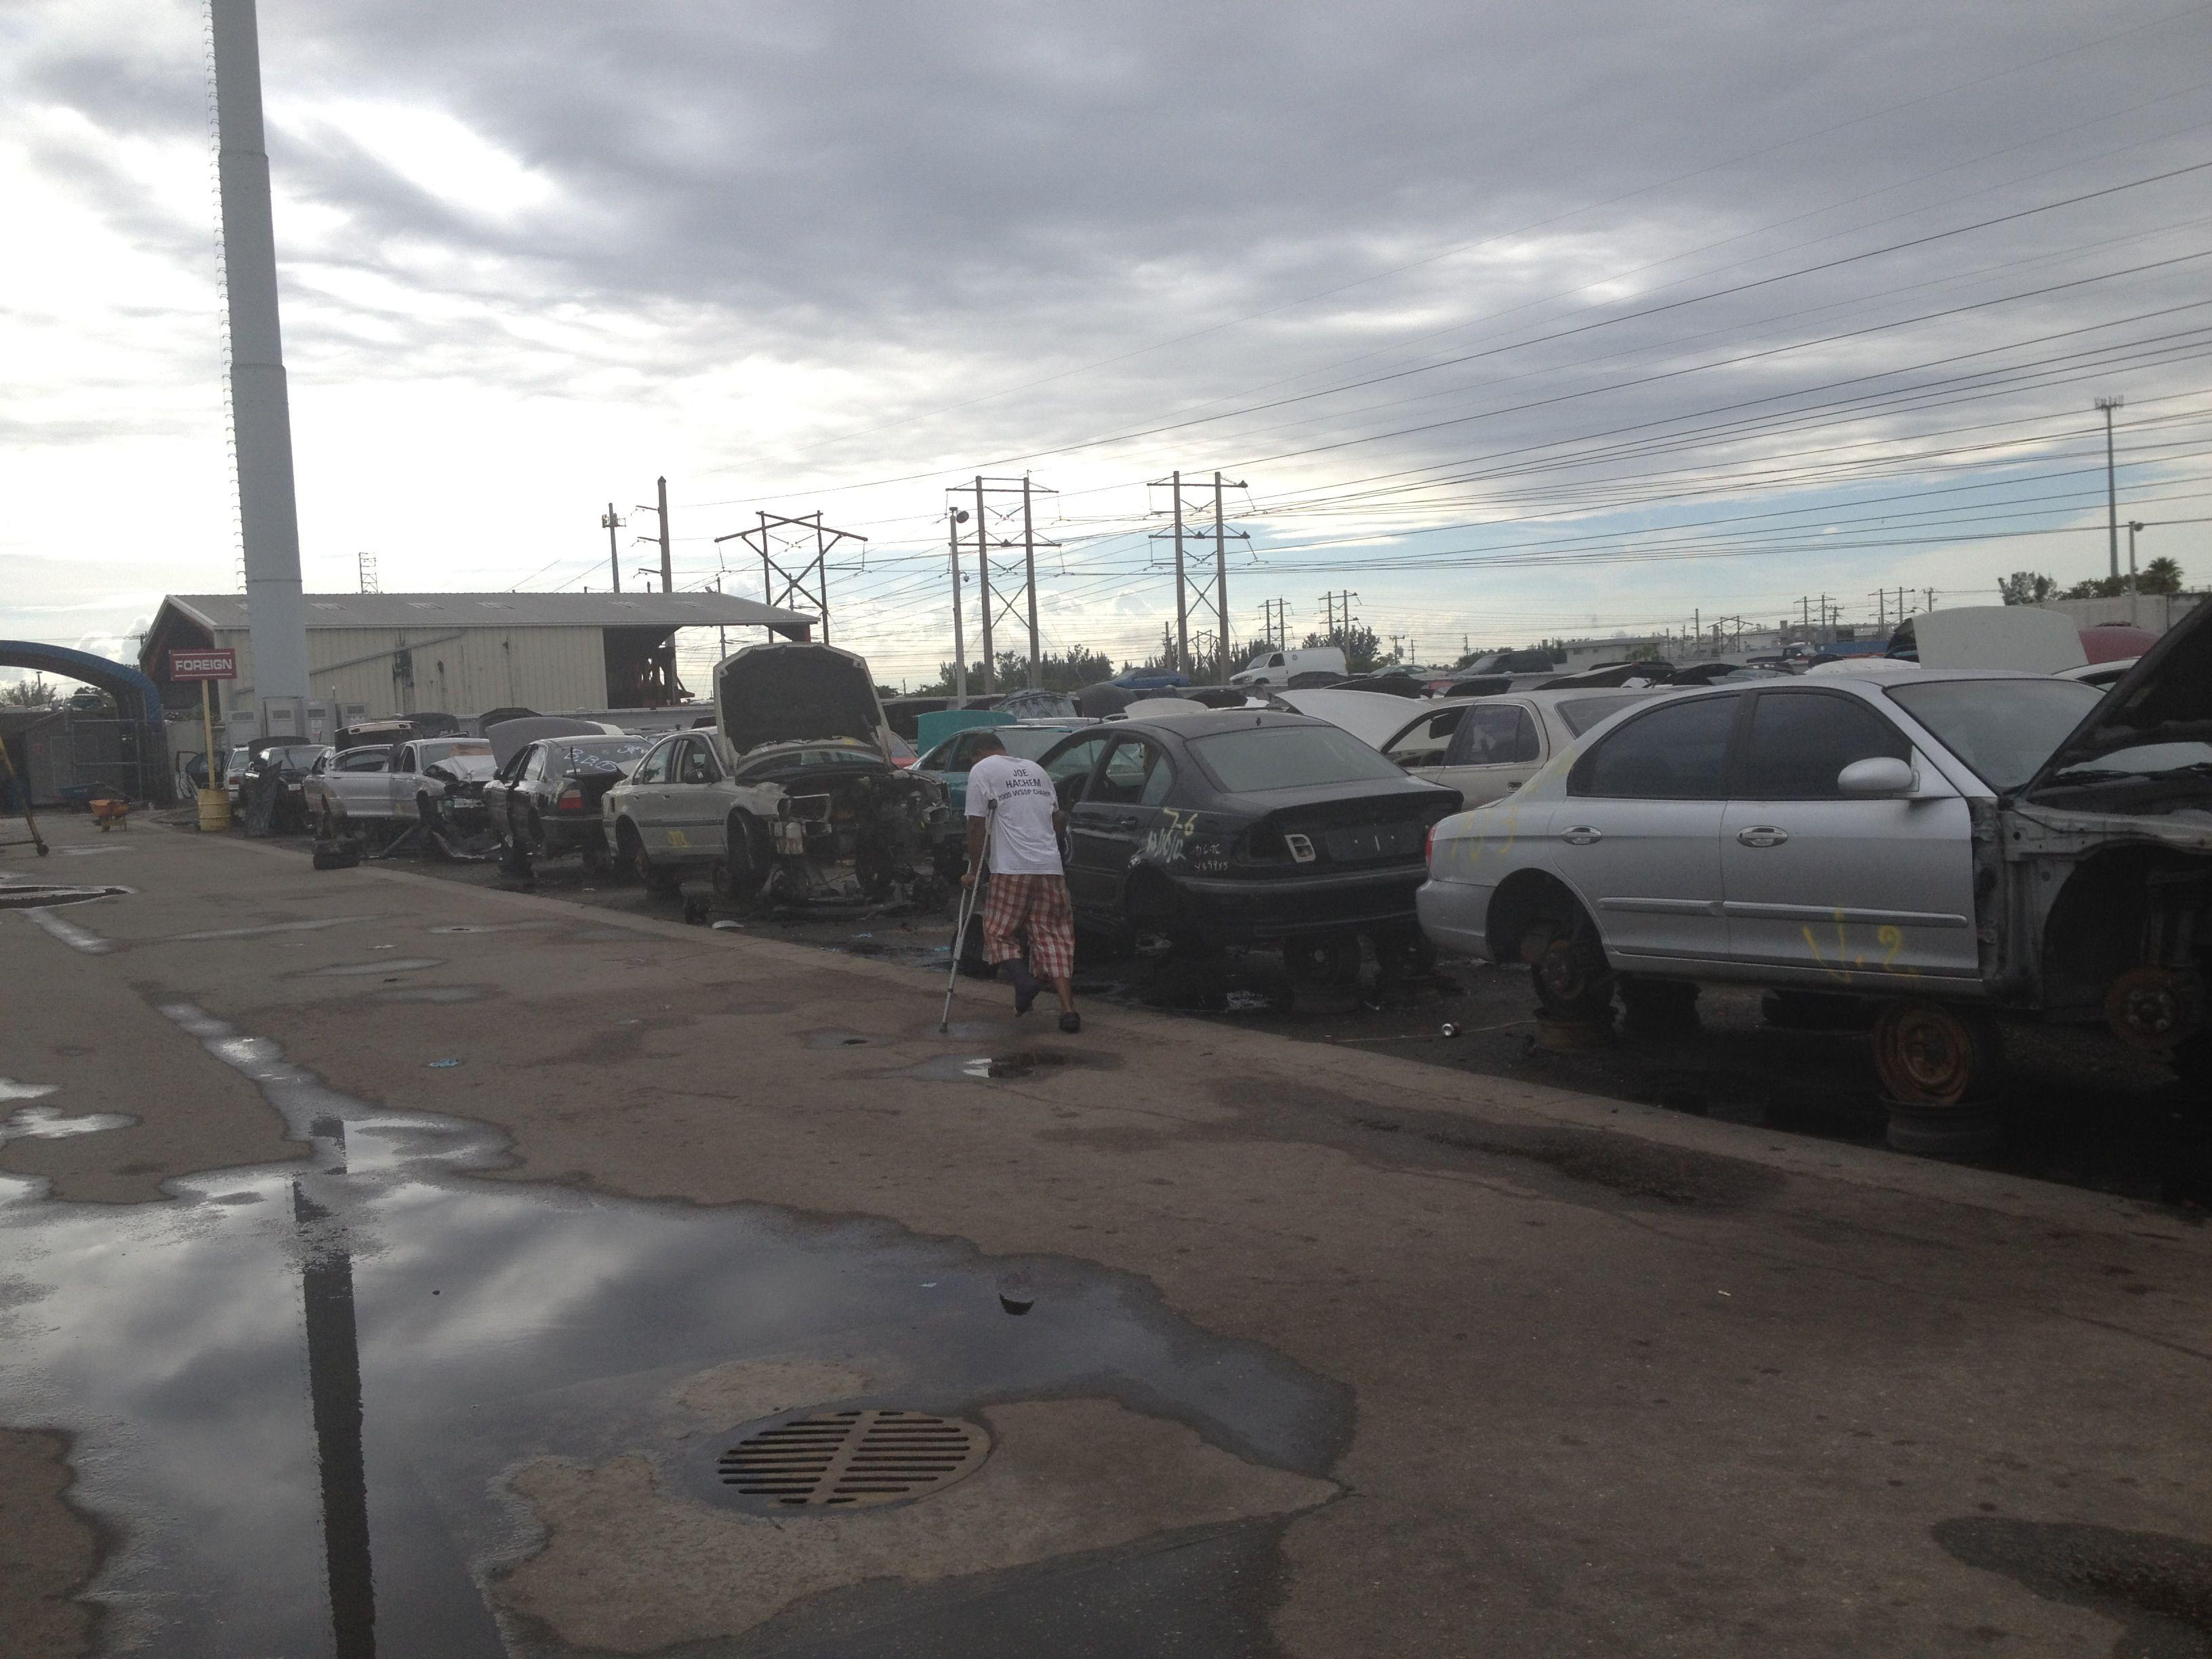 Http Www U Pick And Pull Com Junkyard U Pull It Lkq Daytona Daytona Junkyard Donate Your Car Yard